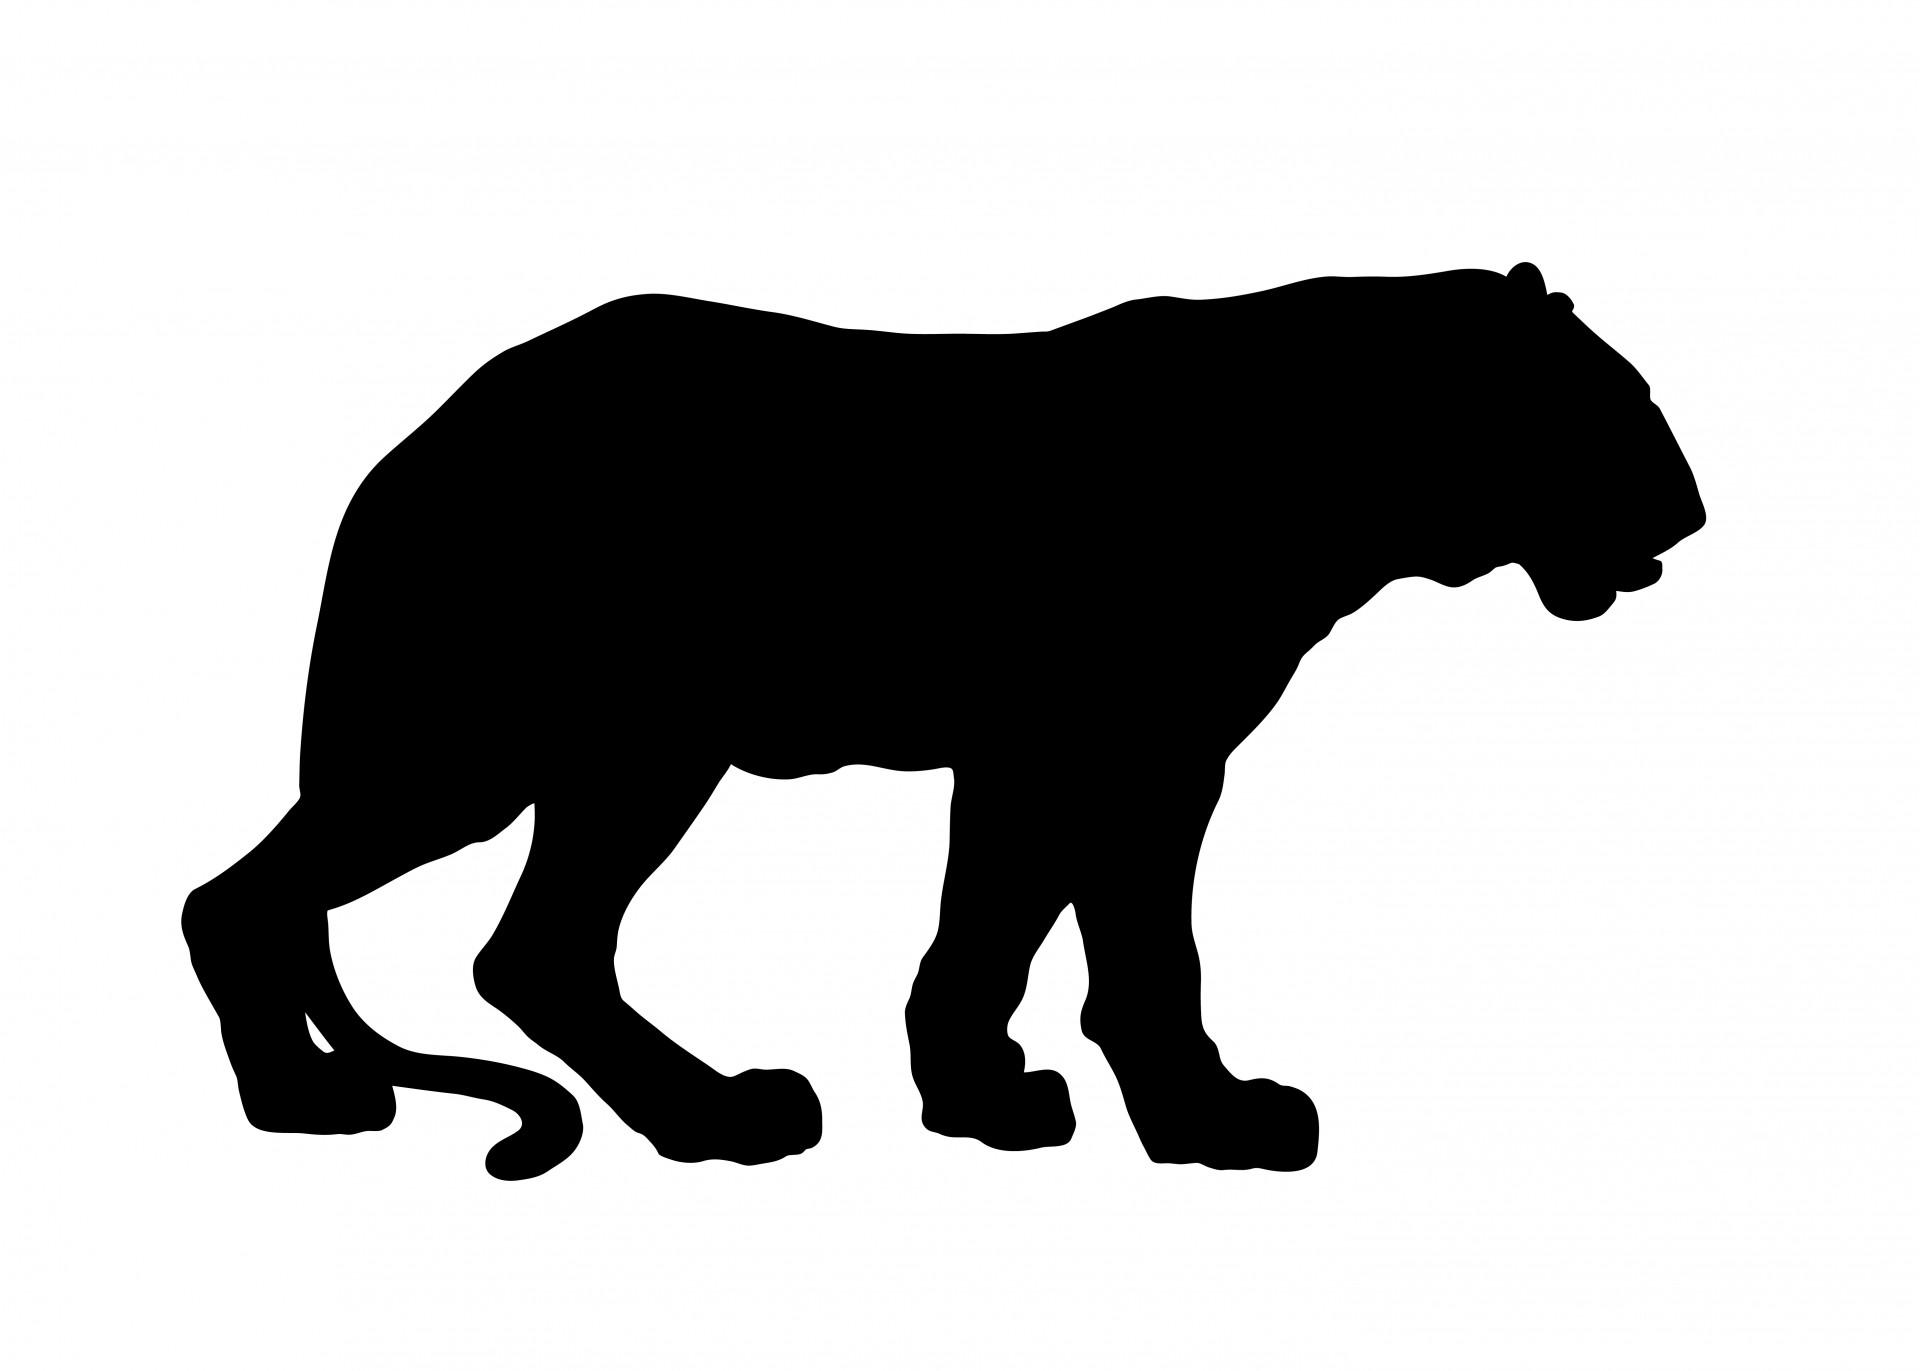 1920x1371 Tiger Silhouette Free Stock Photo